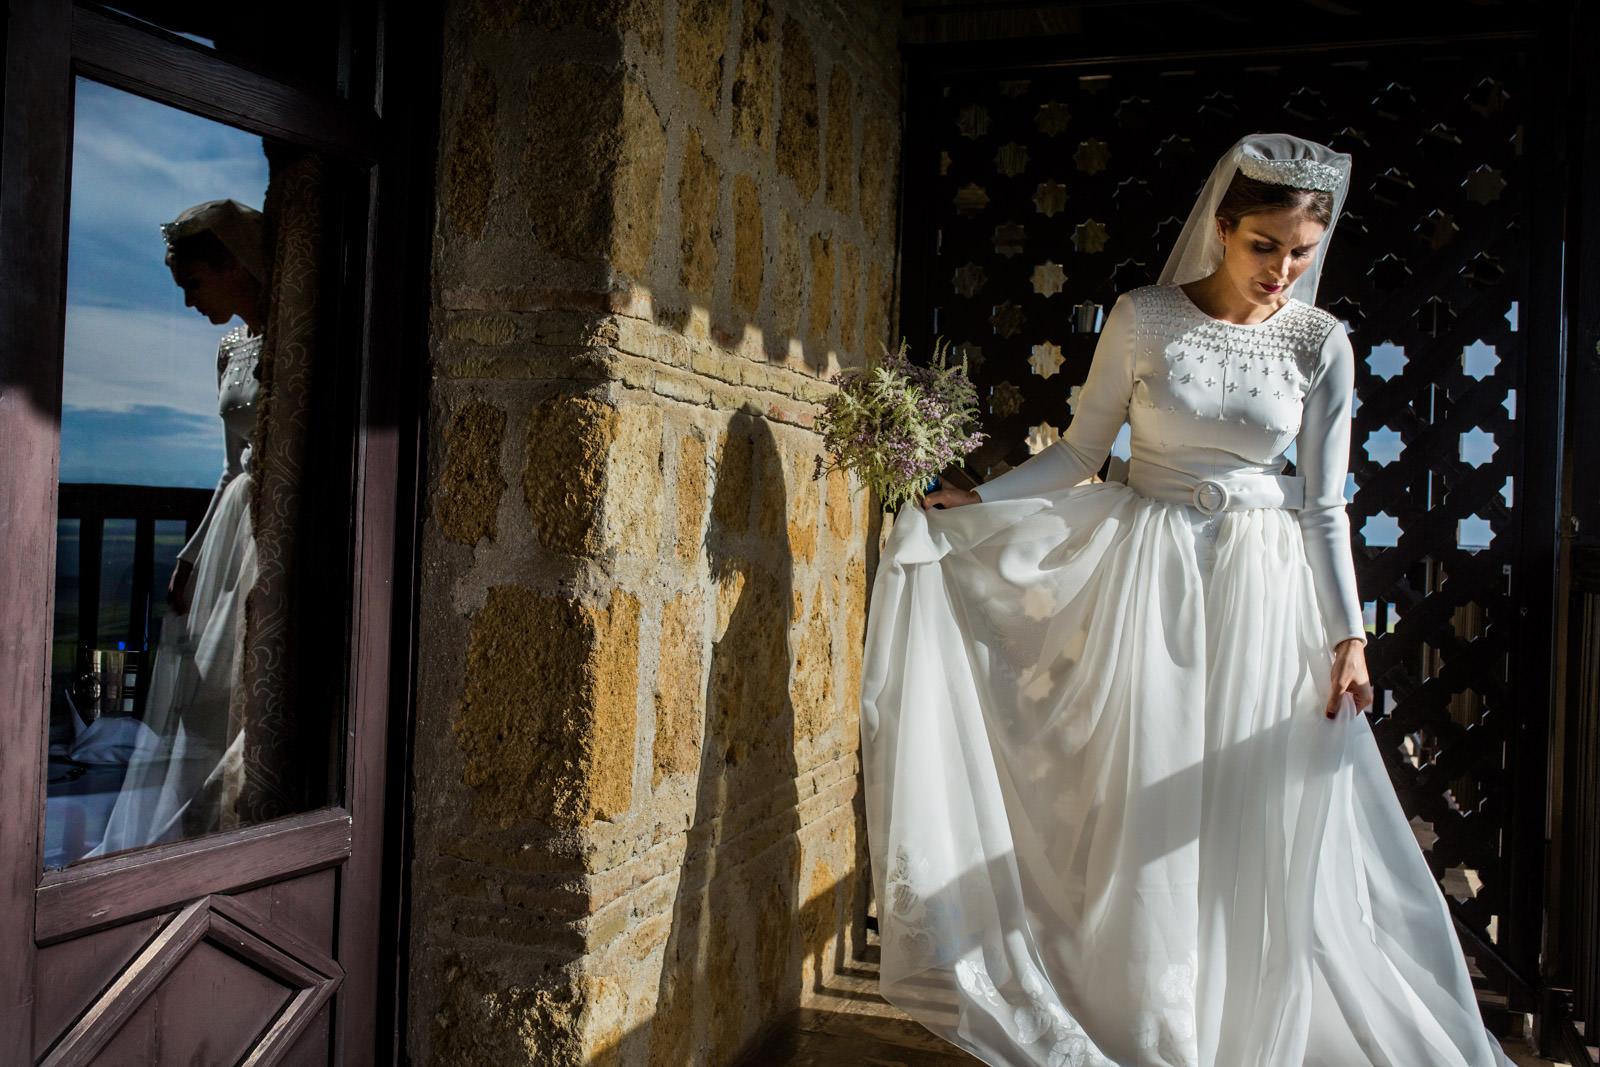 Boda-Sevilla-Parador-Carmona-bridal-engagement-Rafael-Torres-fotografo-bodas-sevilla-madrid-barcelona-wedding-photographer--29.jpg